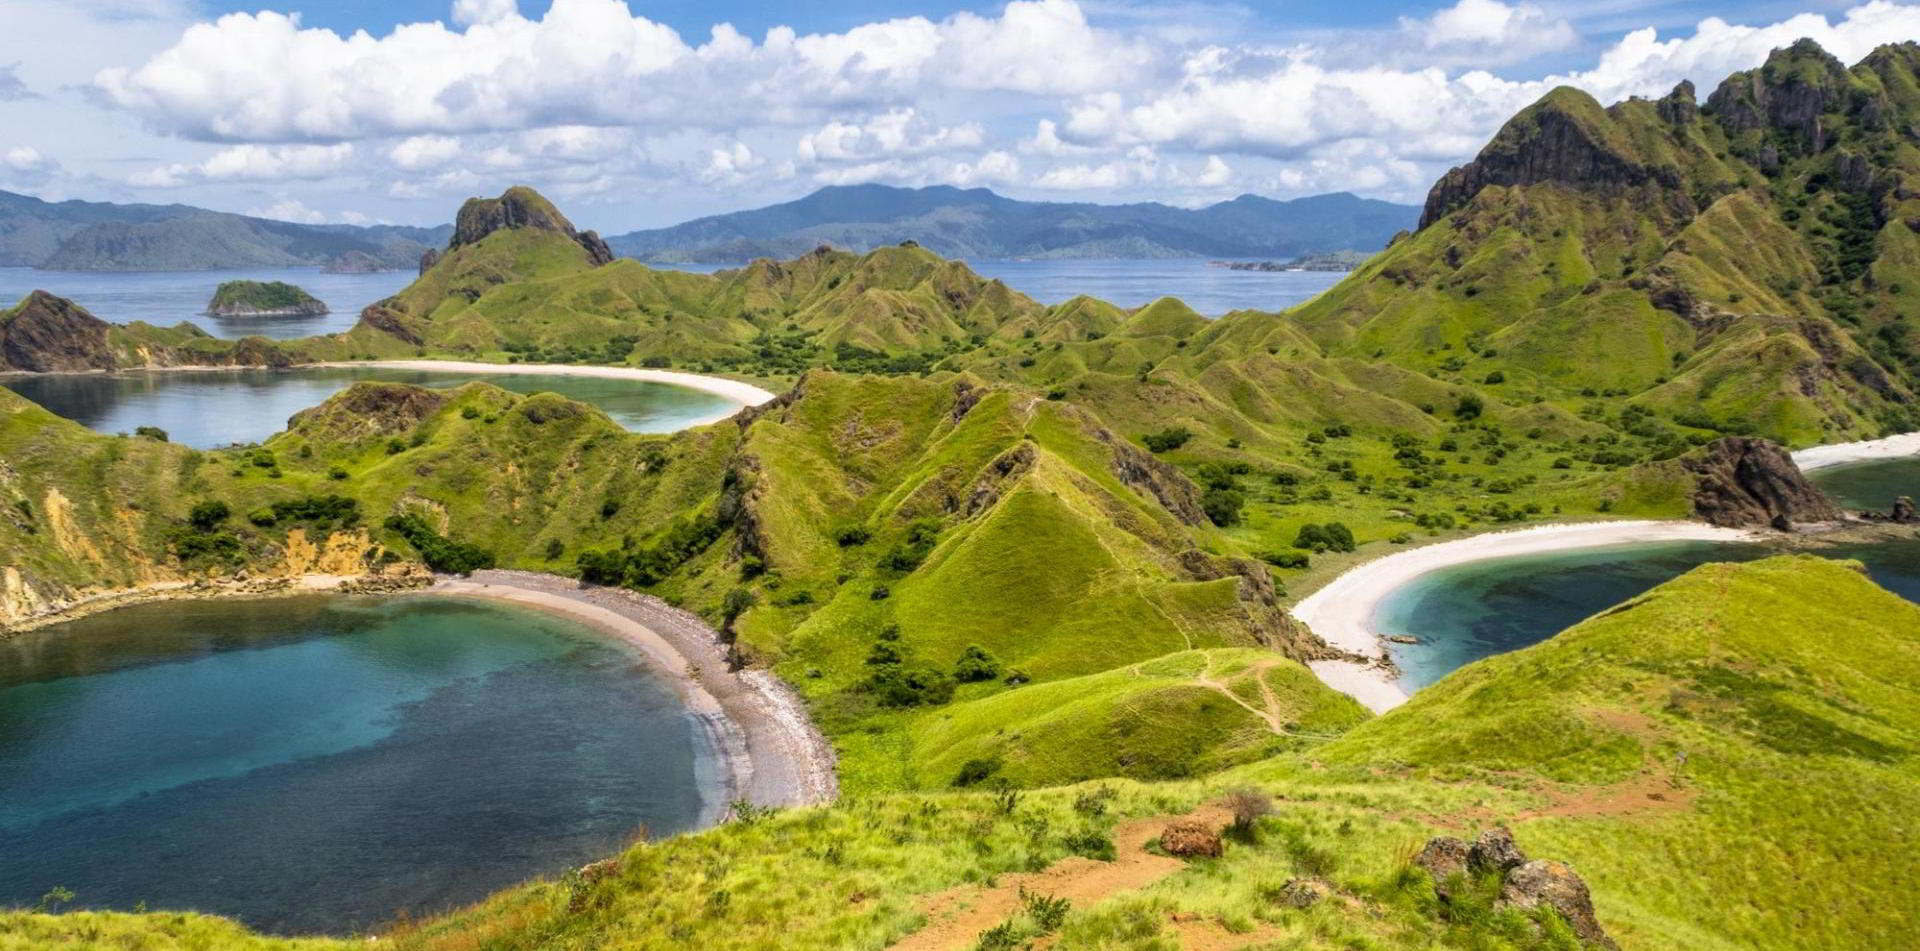 Flores Komodo Reise - Bootstrip Padar-Insel